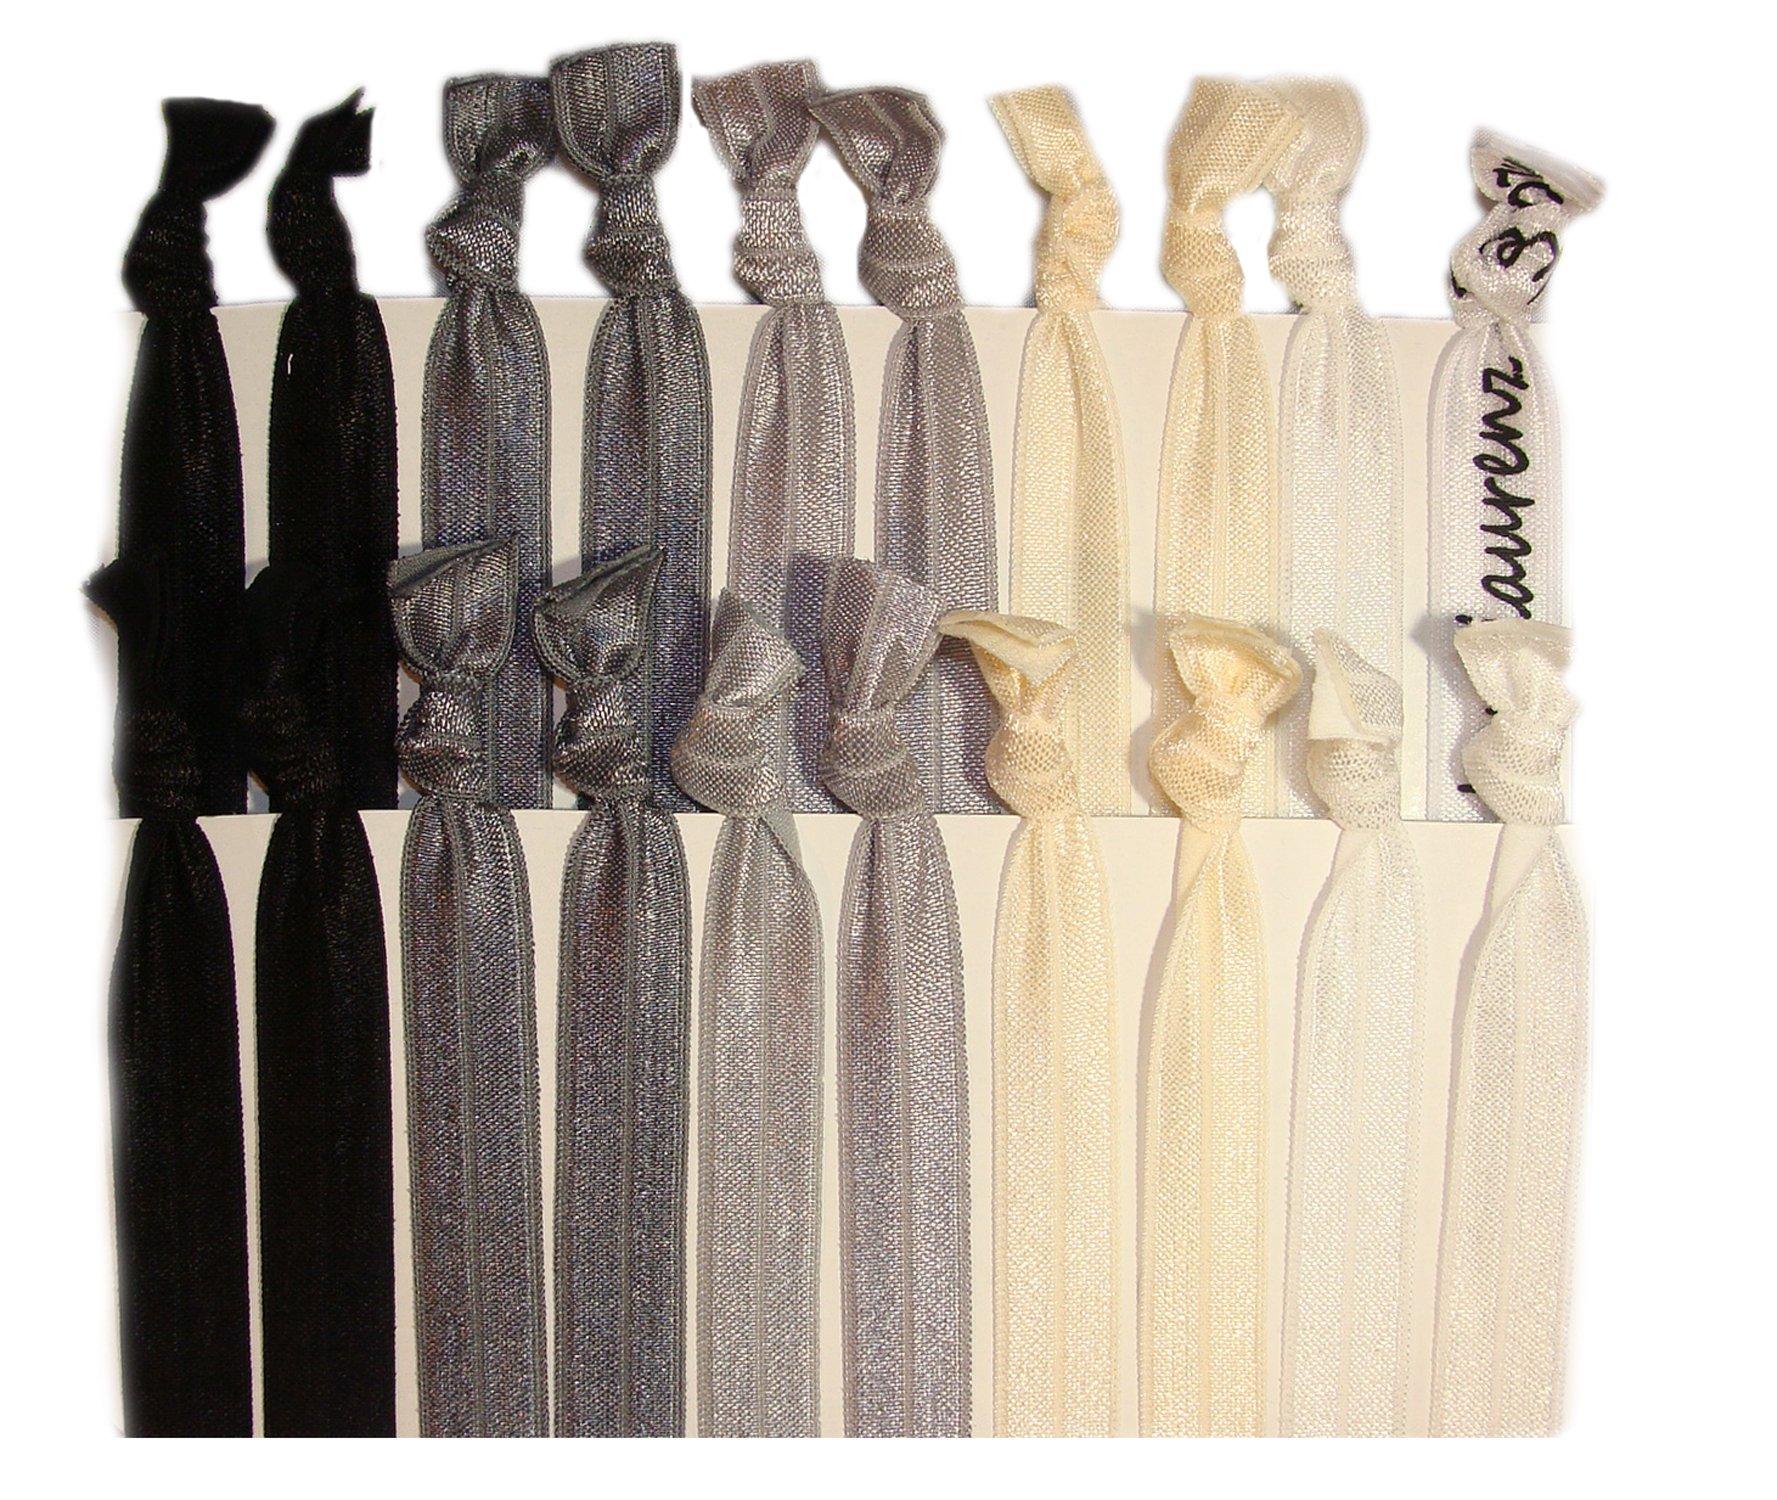 Kenz Laurenz 20 Hair Ties Ponytail Holder, Black Ombre